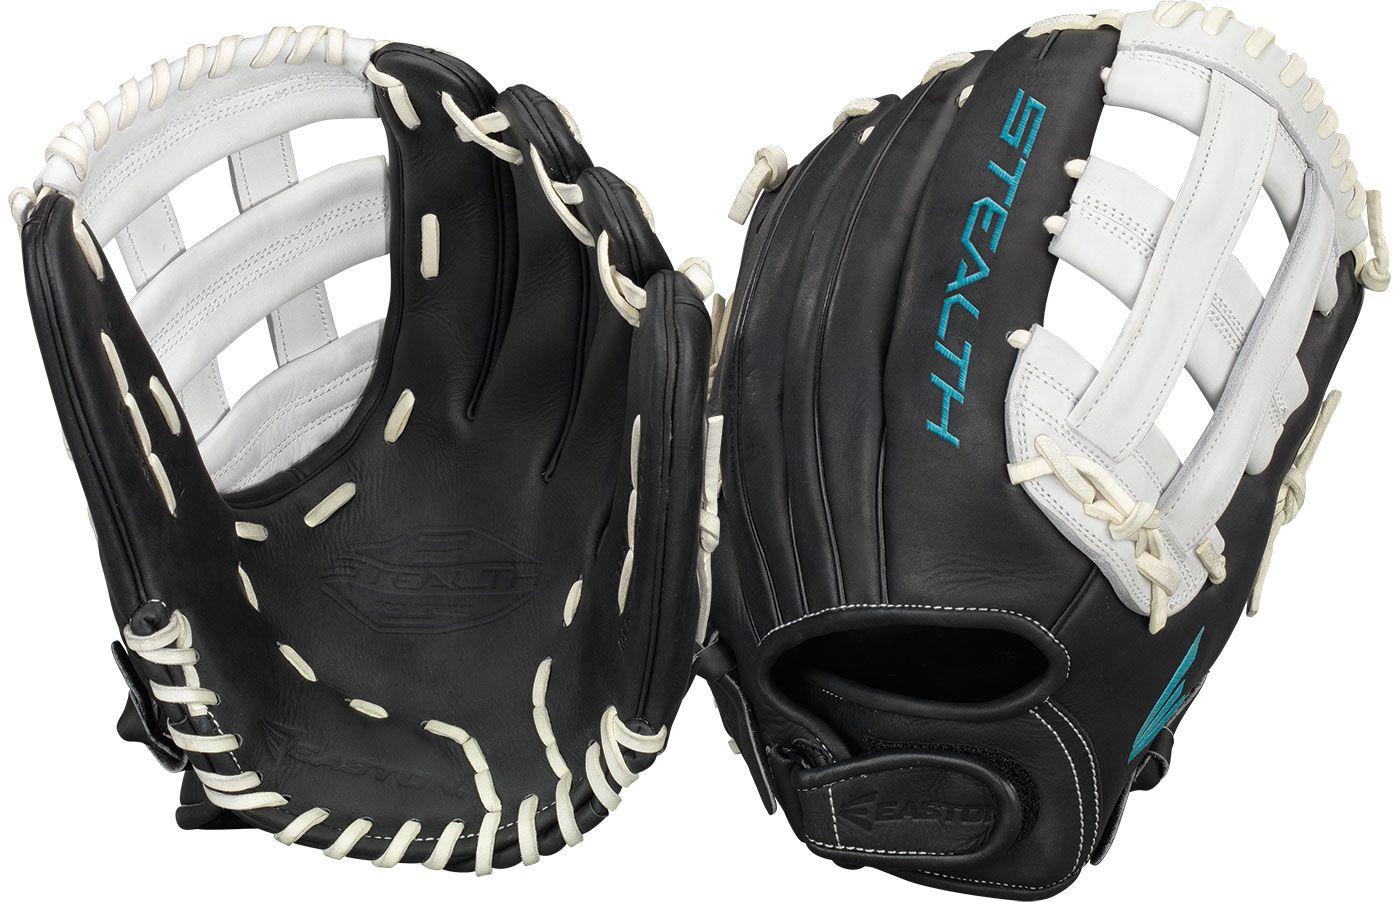 Easton 12.75'' Stealth Pro Series Fastpitch Glove